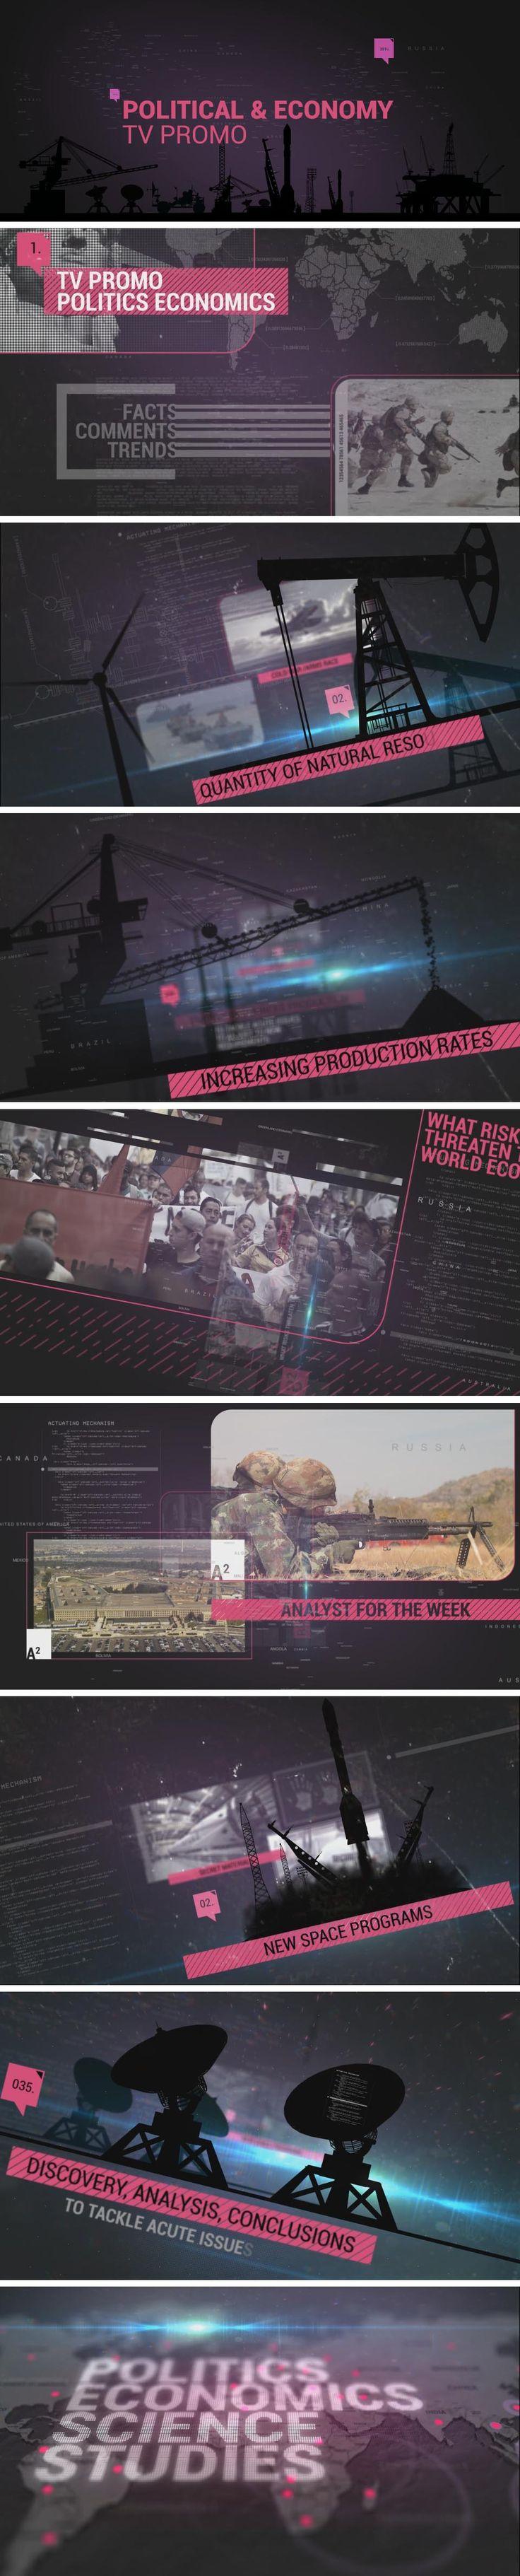 Political & Economy TV Promo (Abstract)